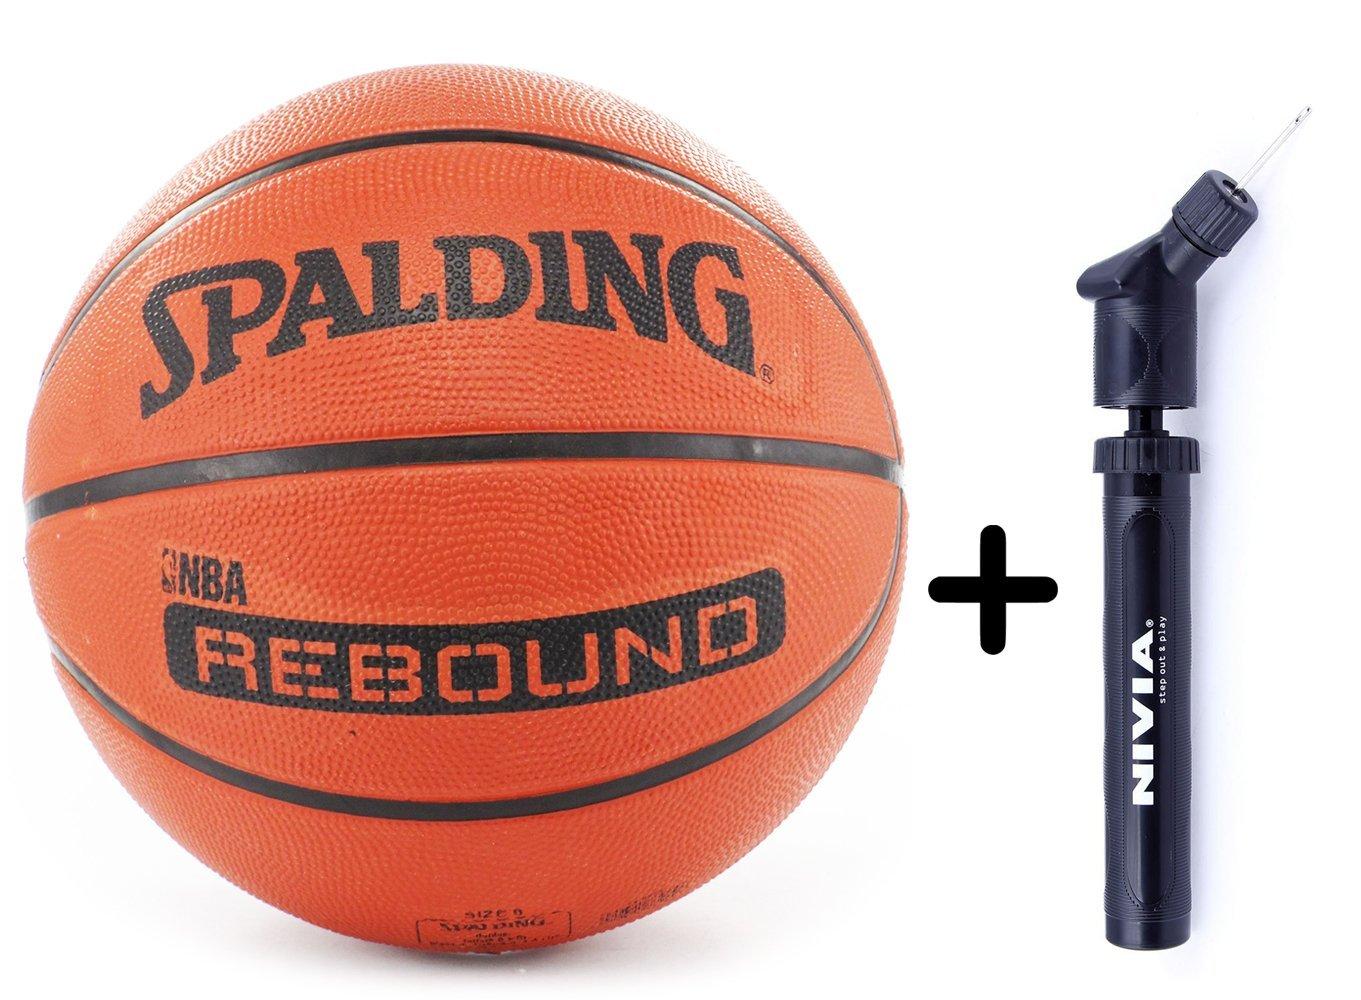 Spalding baloncesto de rebote 7 Combo (Spalding NBA rebote ...